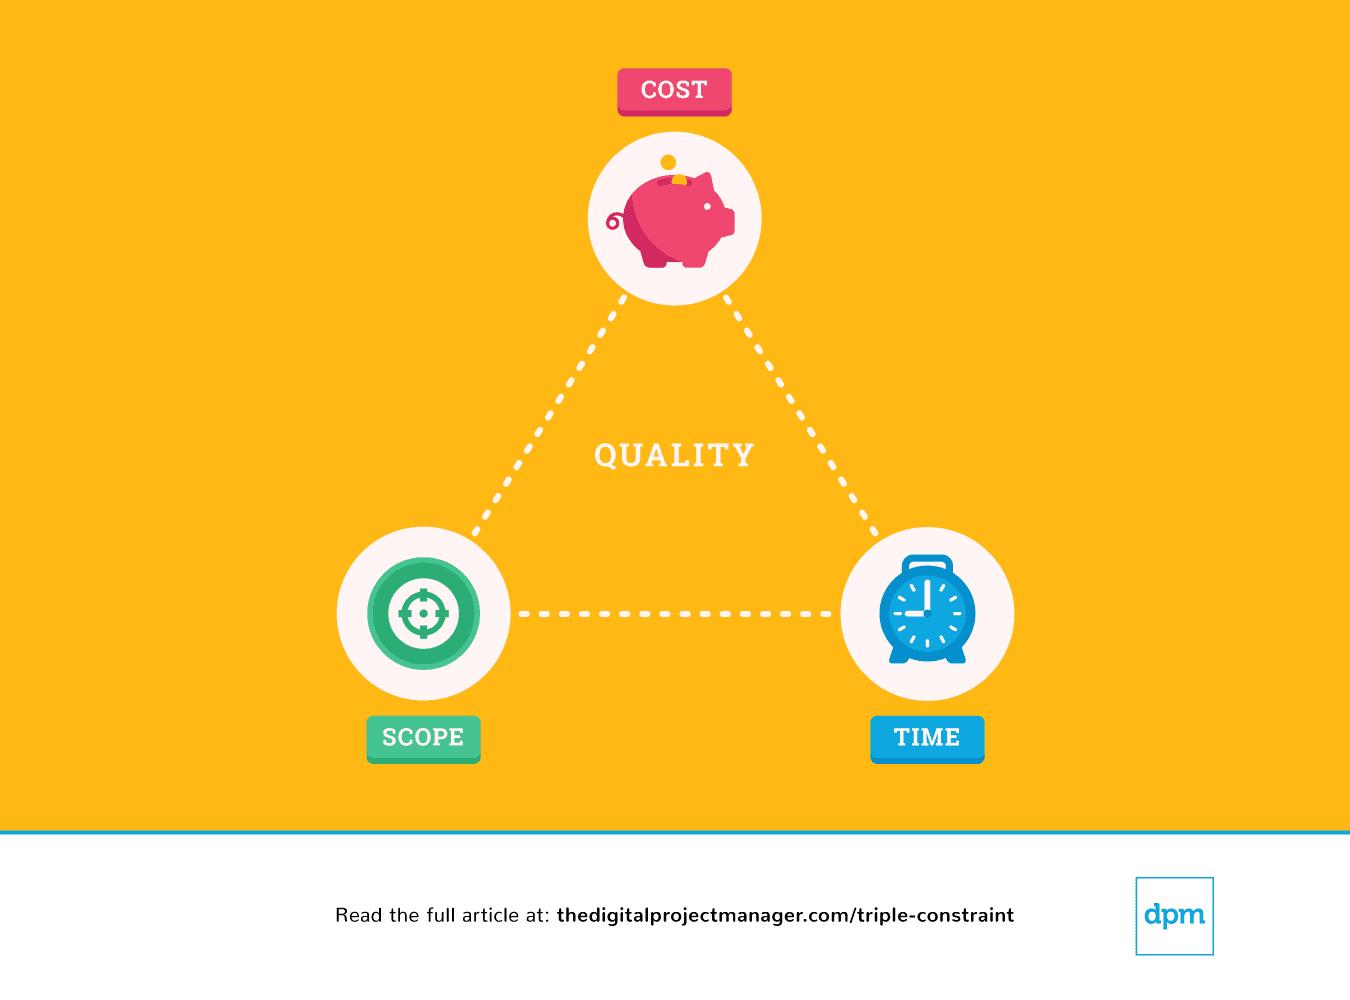 project-management-triple-constraint-infographic-quality